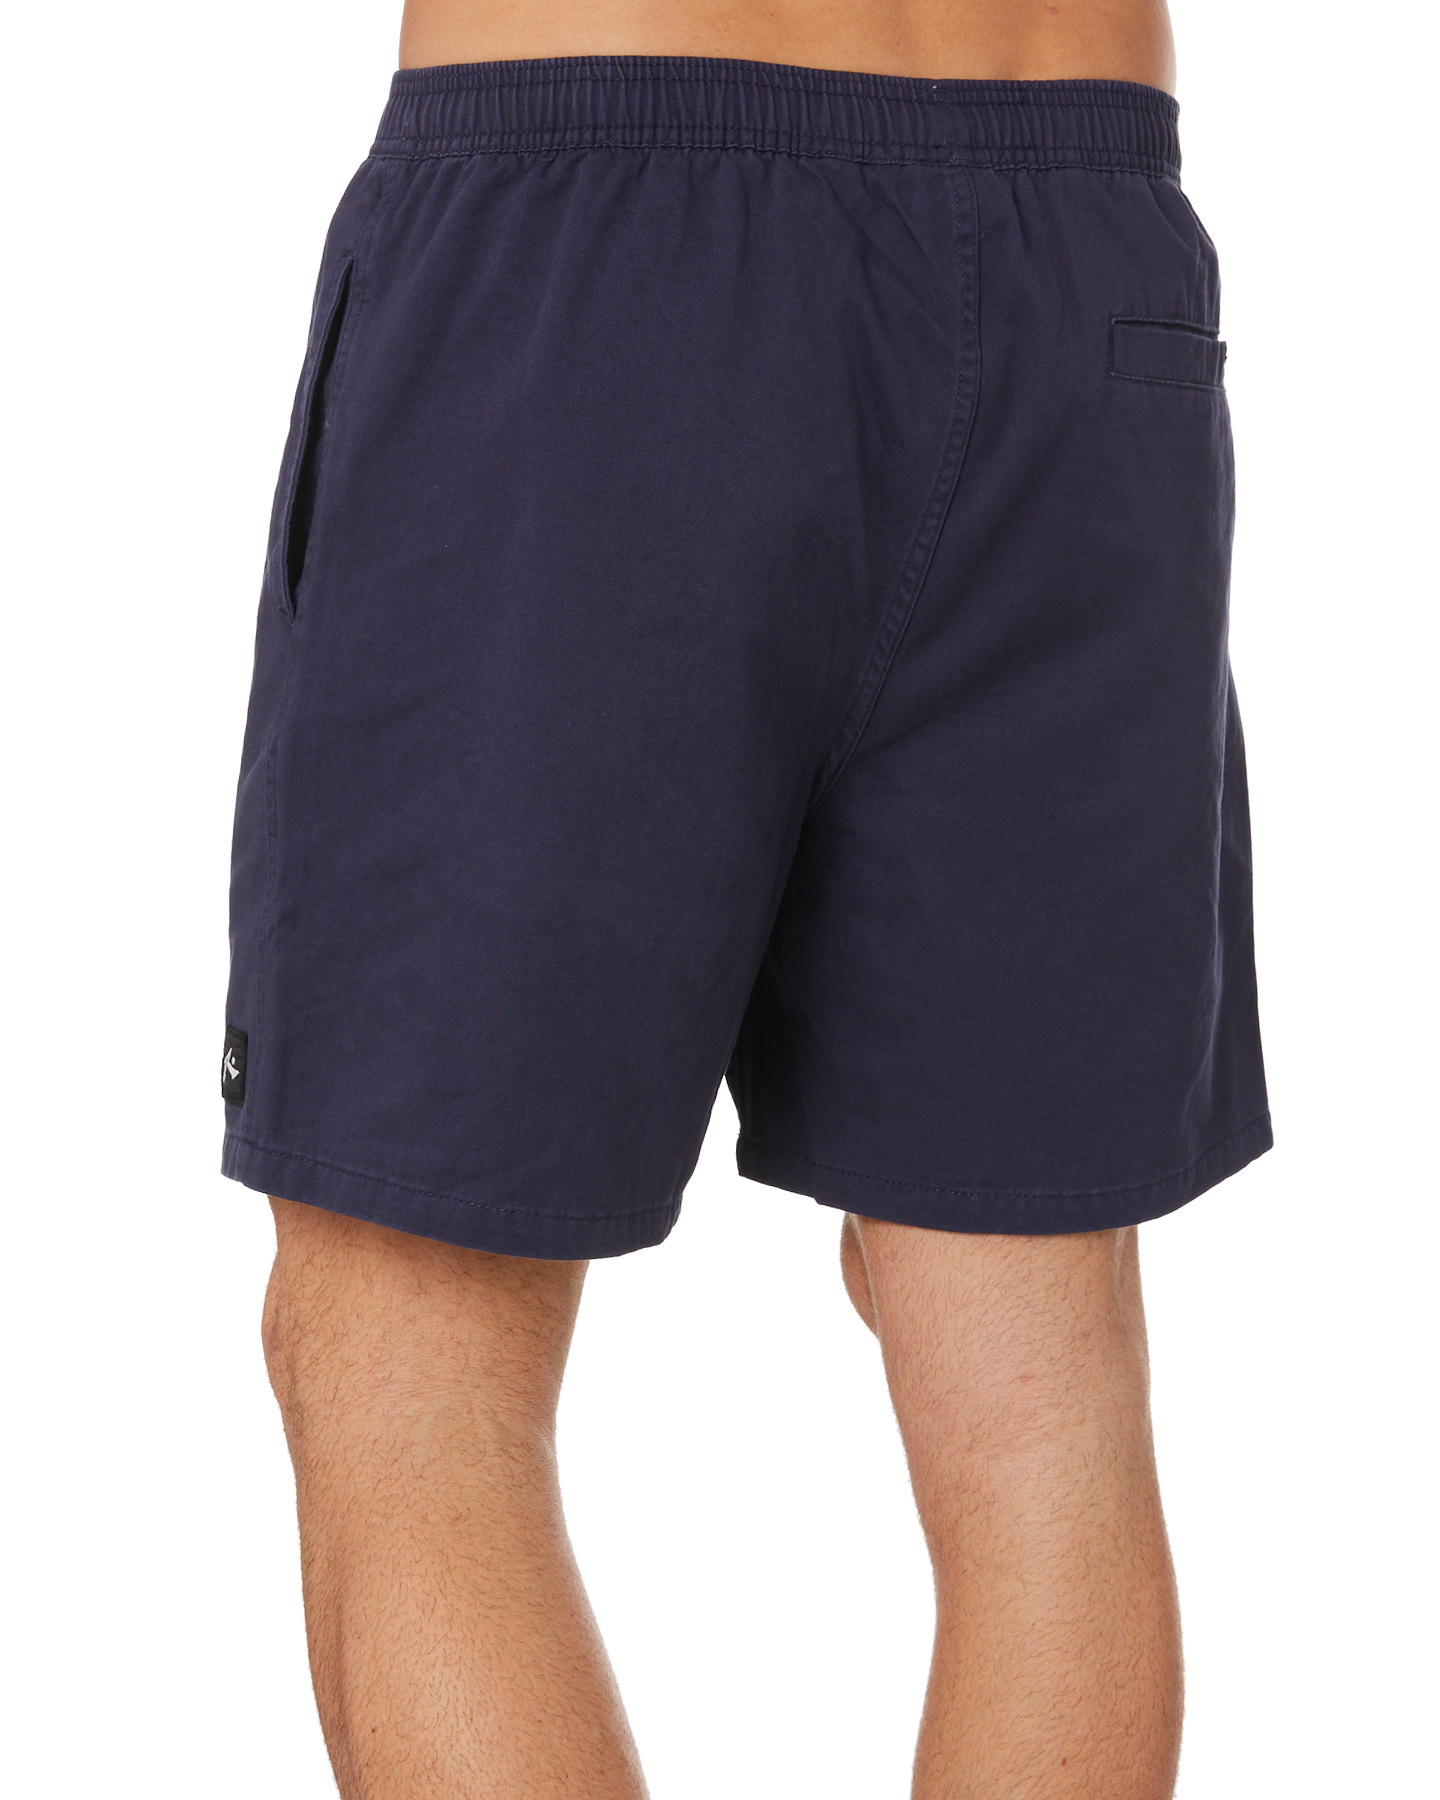 New-Rusty-Men-039-s-Hook-Elastic-Short-Cotton-Blue thumbnail 13